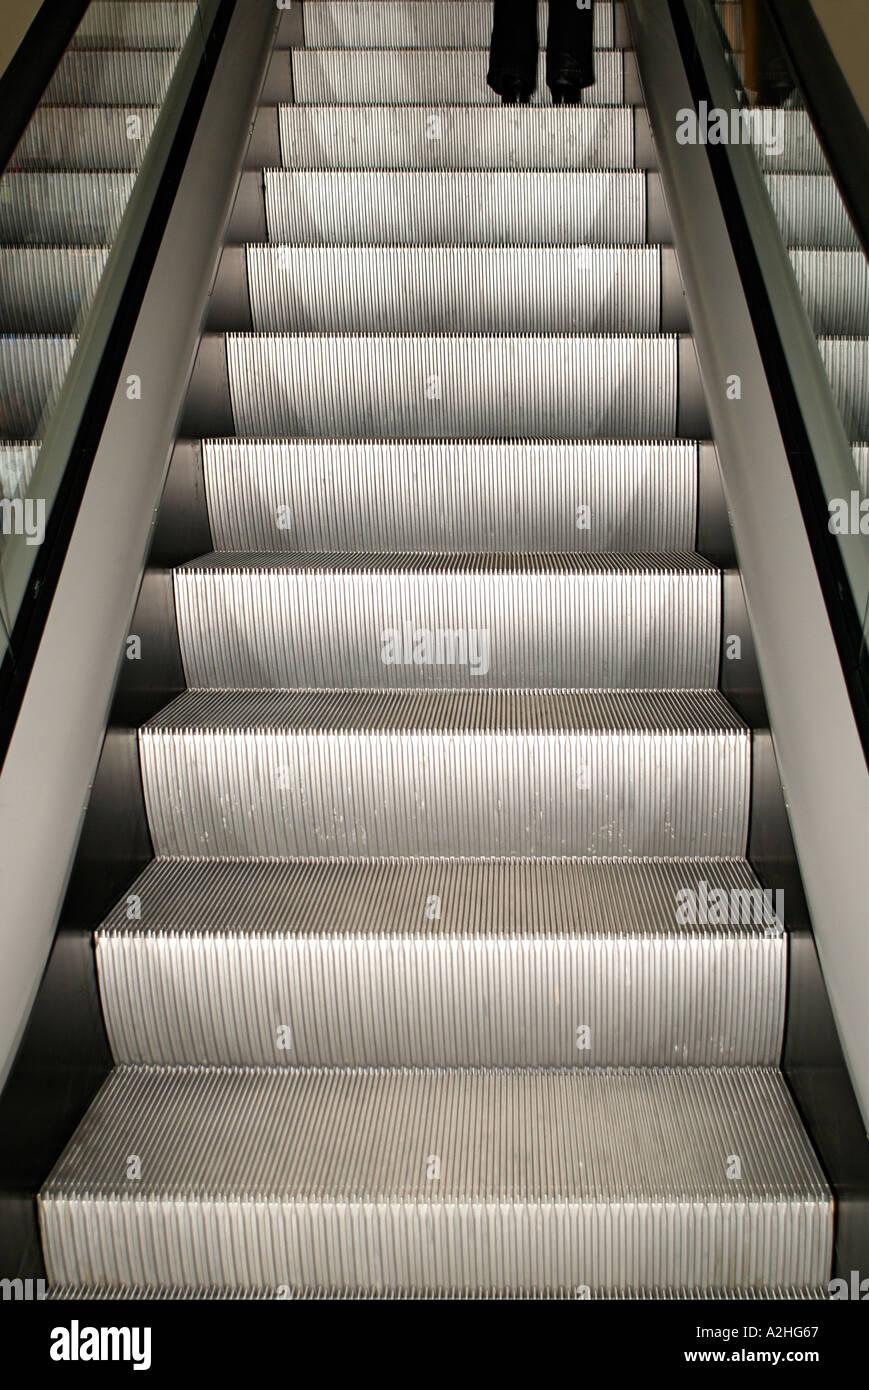 Girl Going Up an Escalator - Stock Image